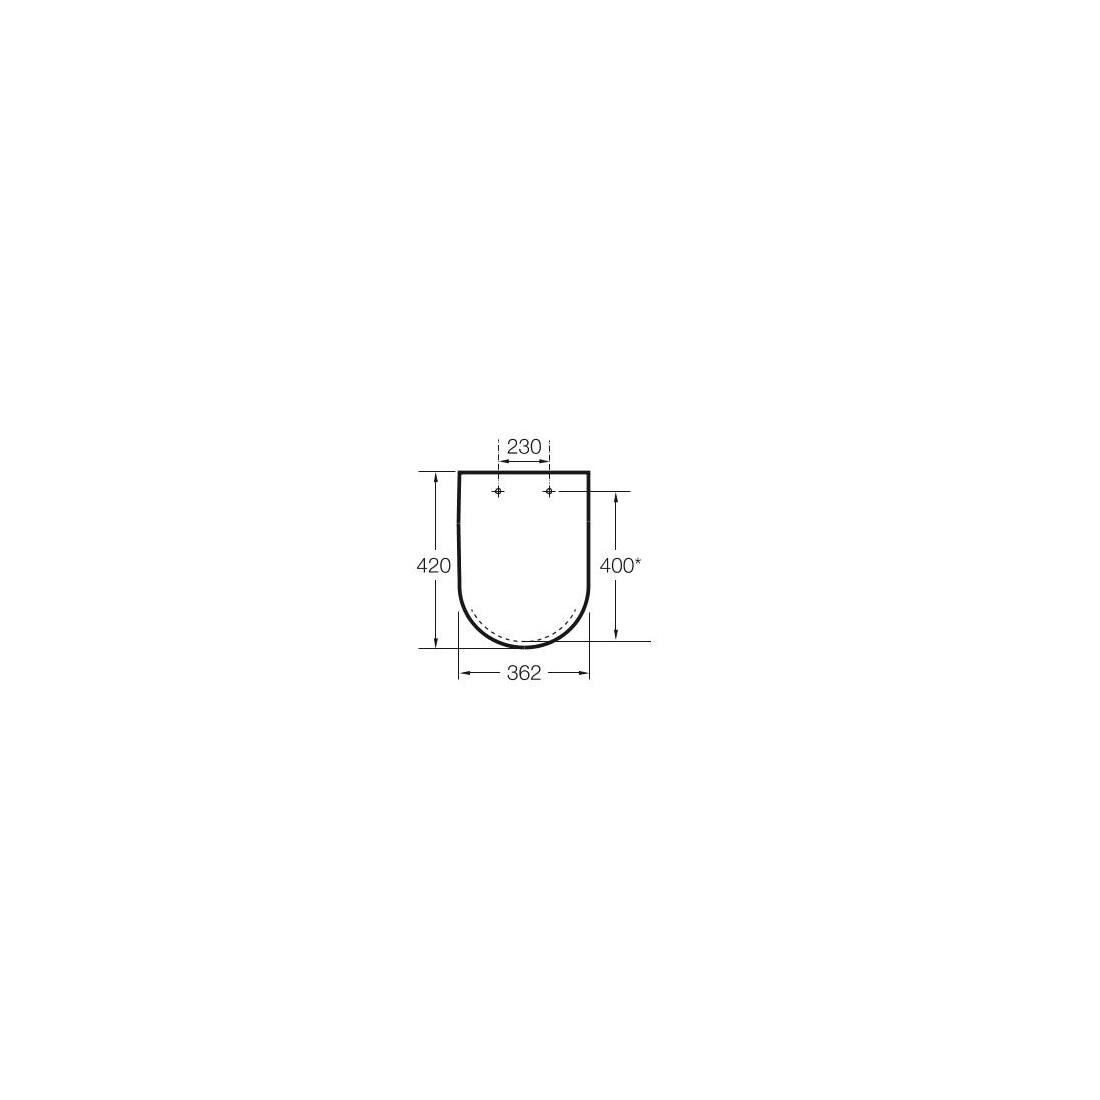 Unitazo sėdynė su dangčiu MERIDIAN  Compact, su Softclose mechanizmu